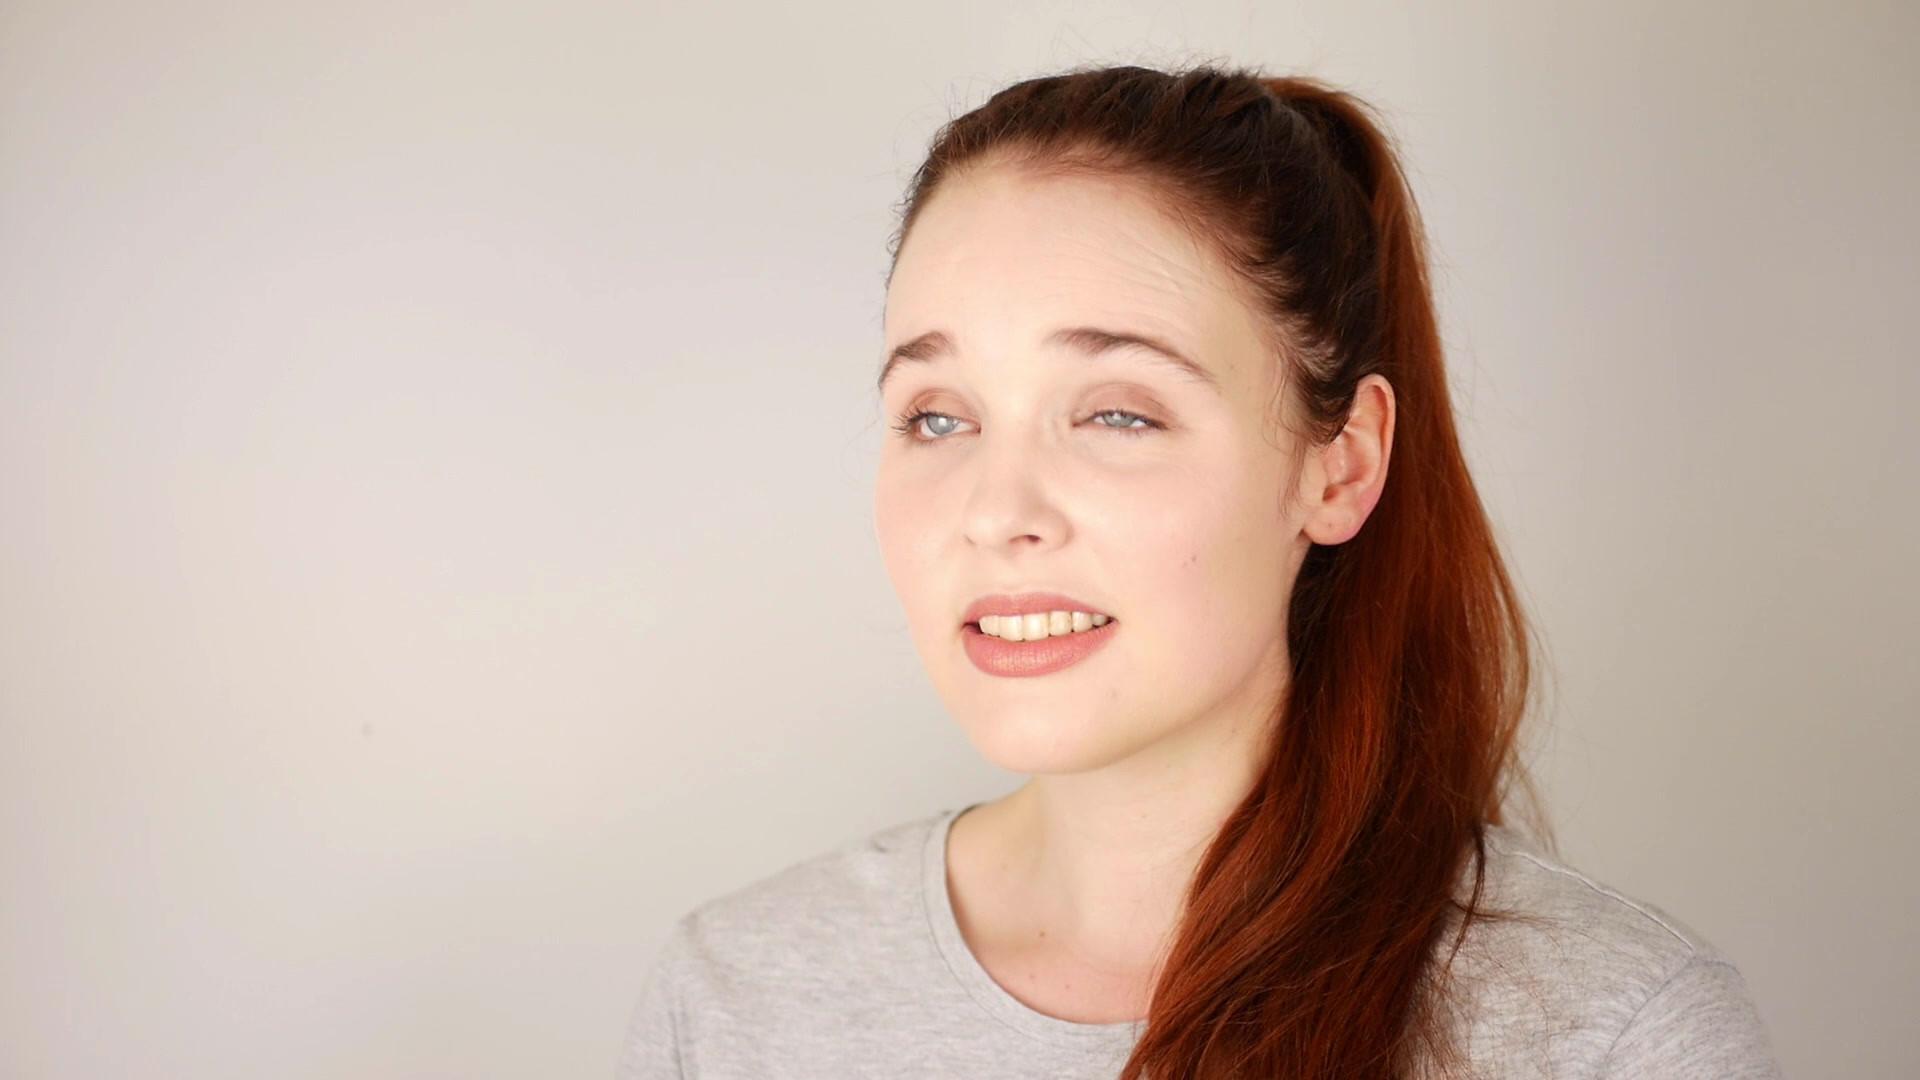 English Accent - Bridget Jones's Diary